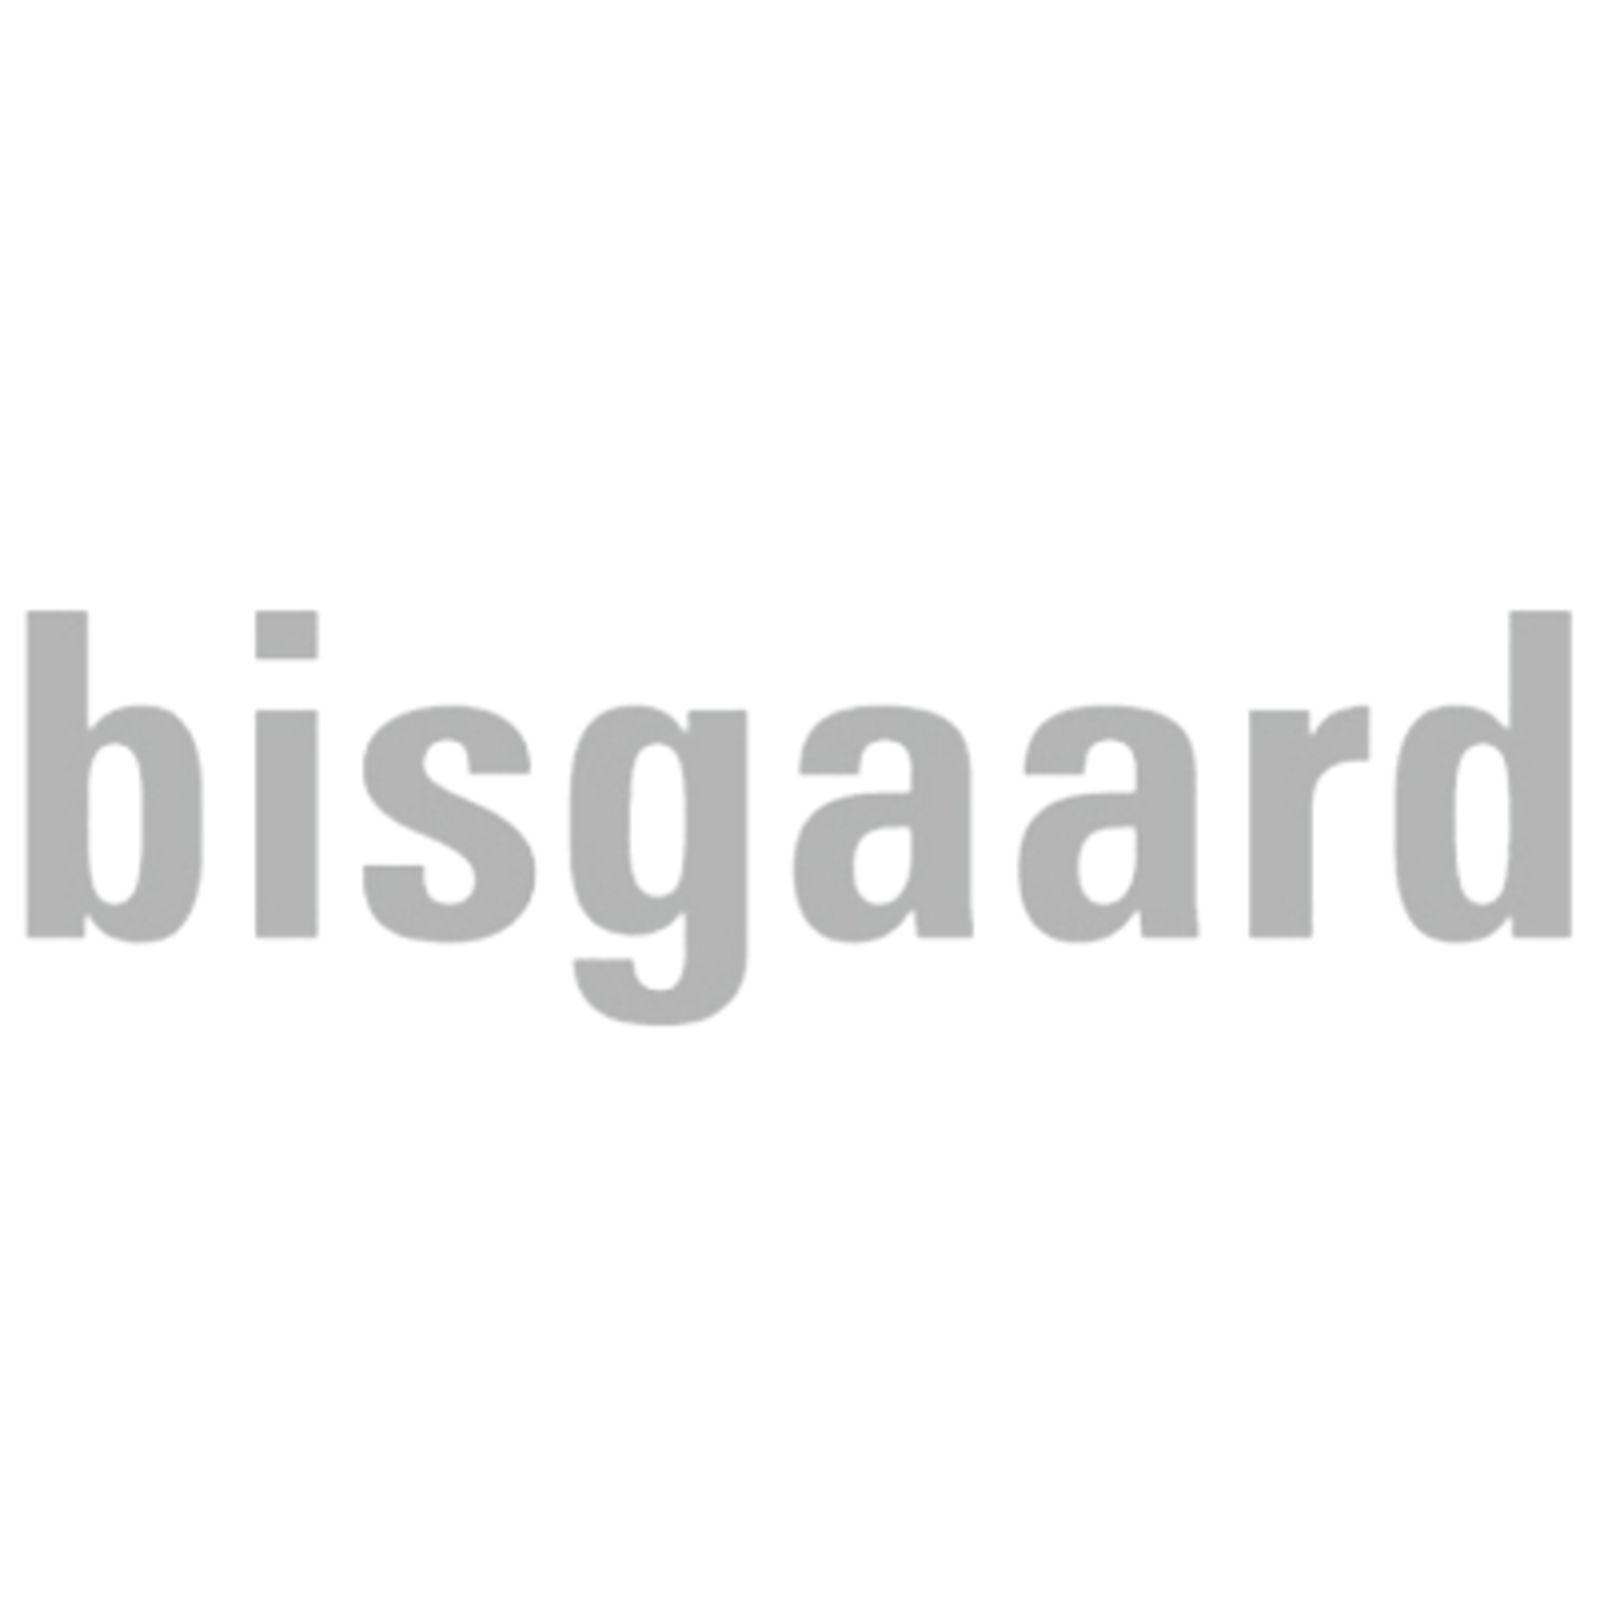 bisgaard